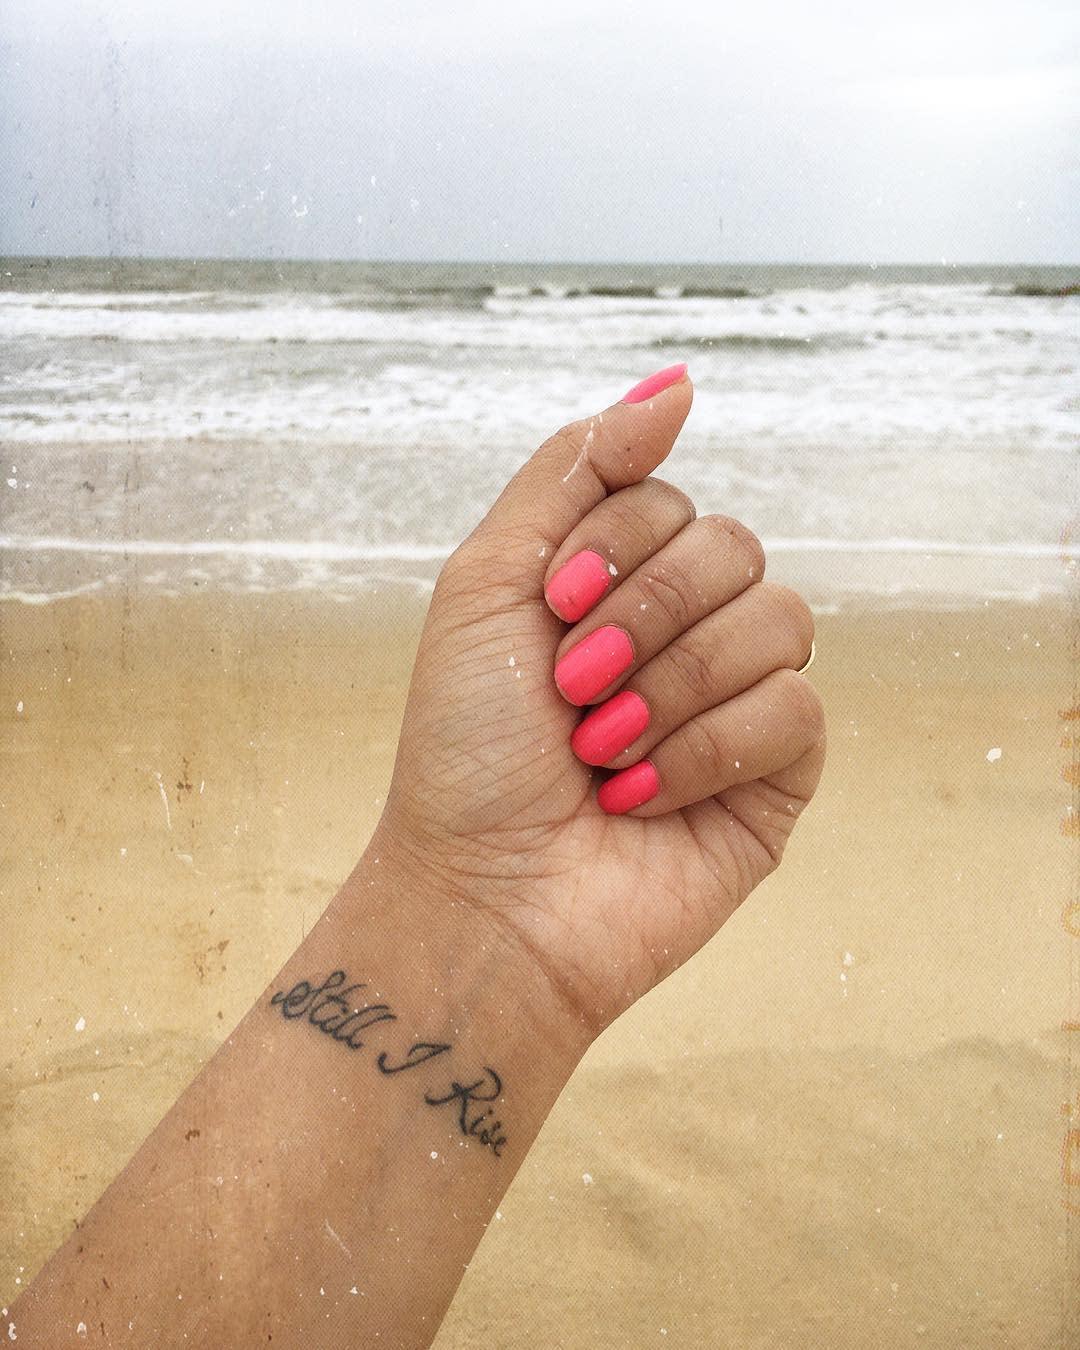 Wrist Still I Rise Tattoo -realgirlco